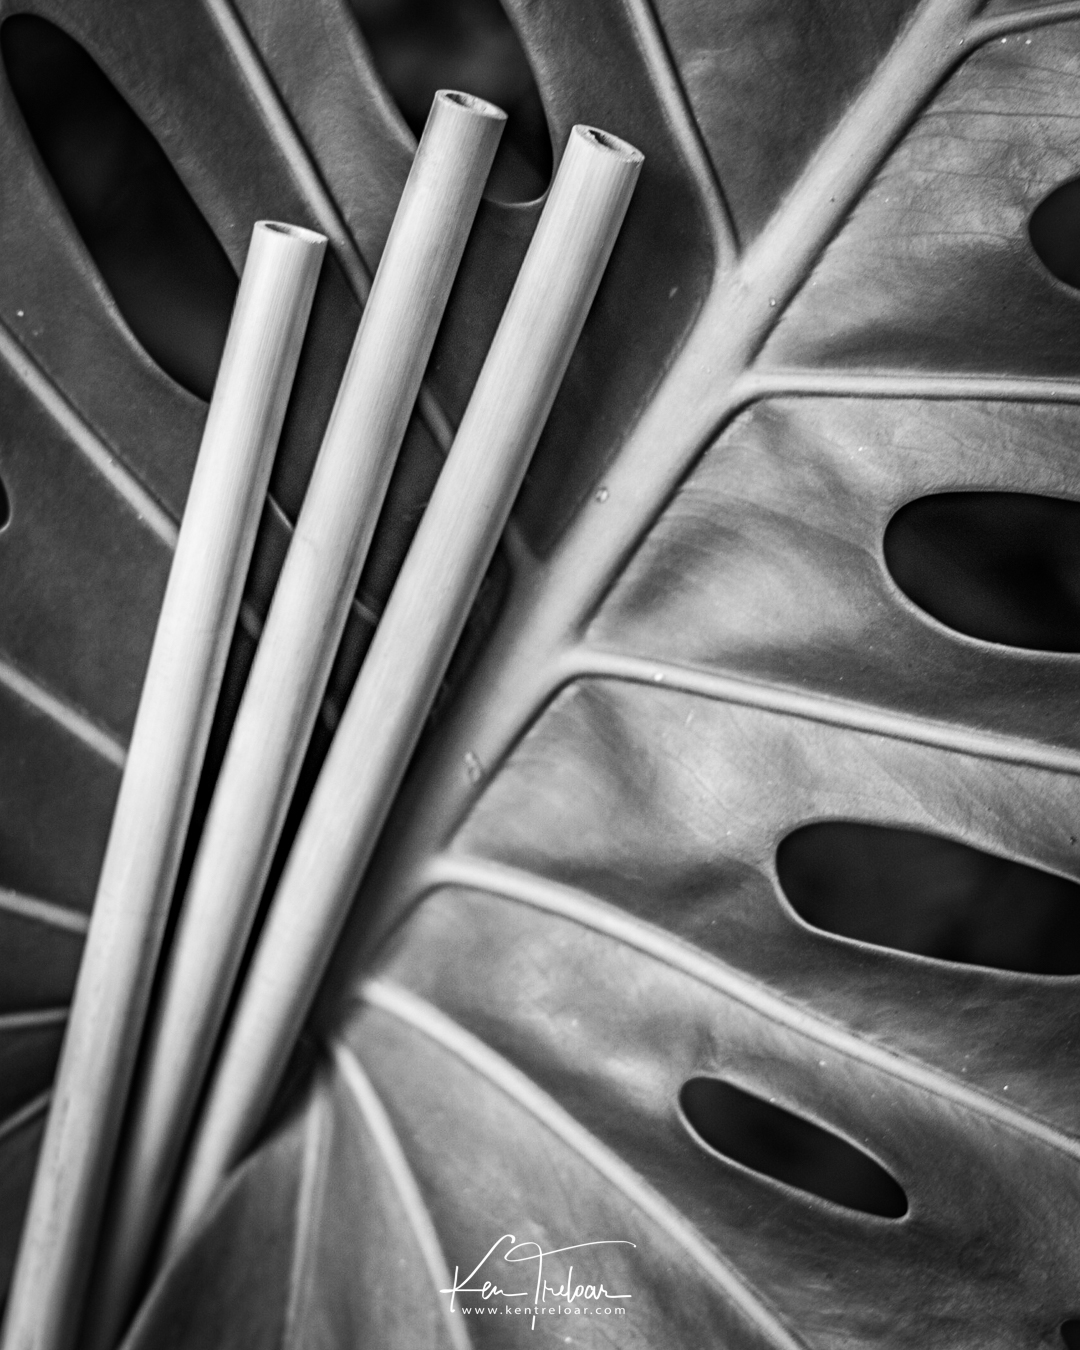 Khanyiso Reed Straws - Zero Plastic - Cape Town-13.jpg